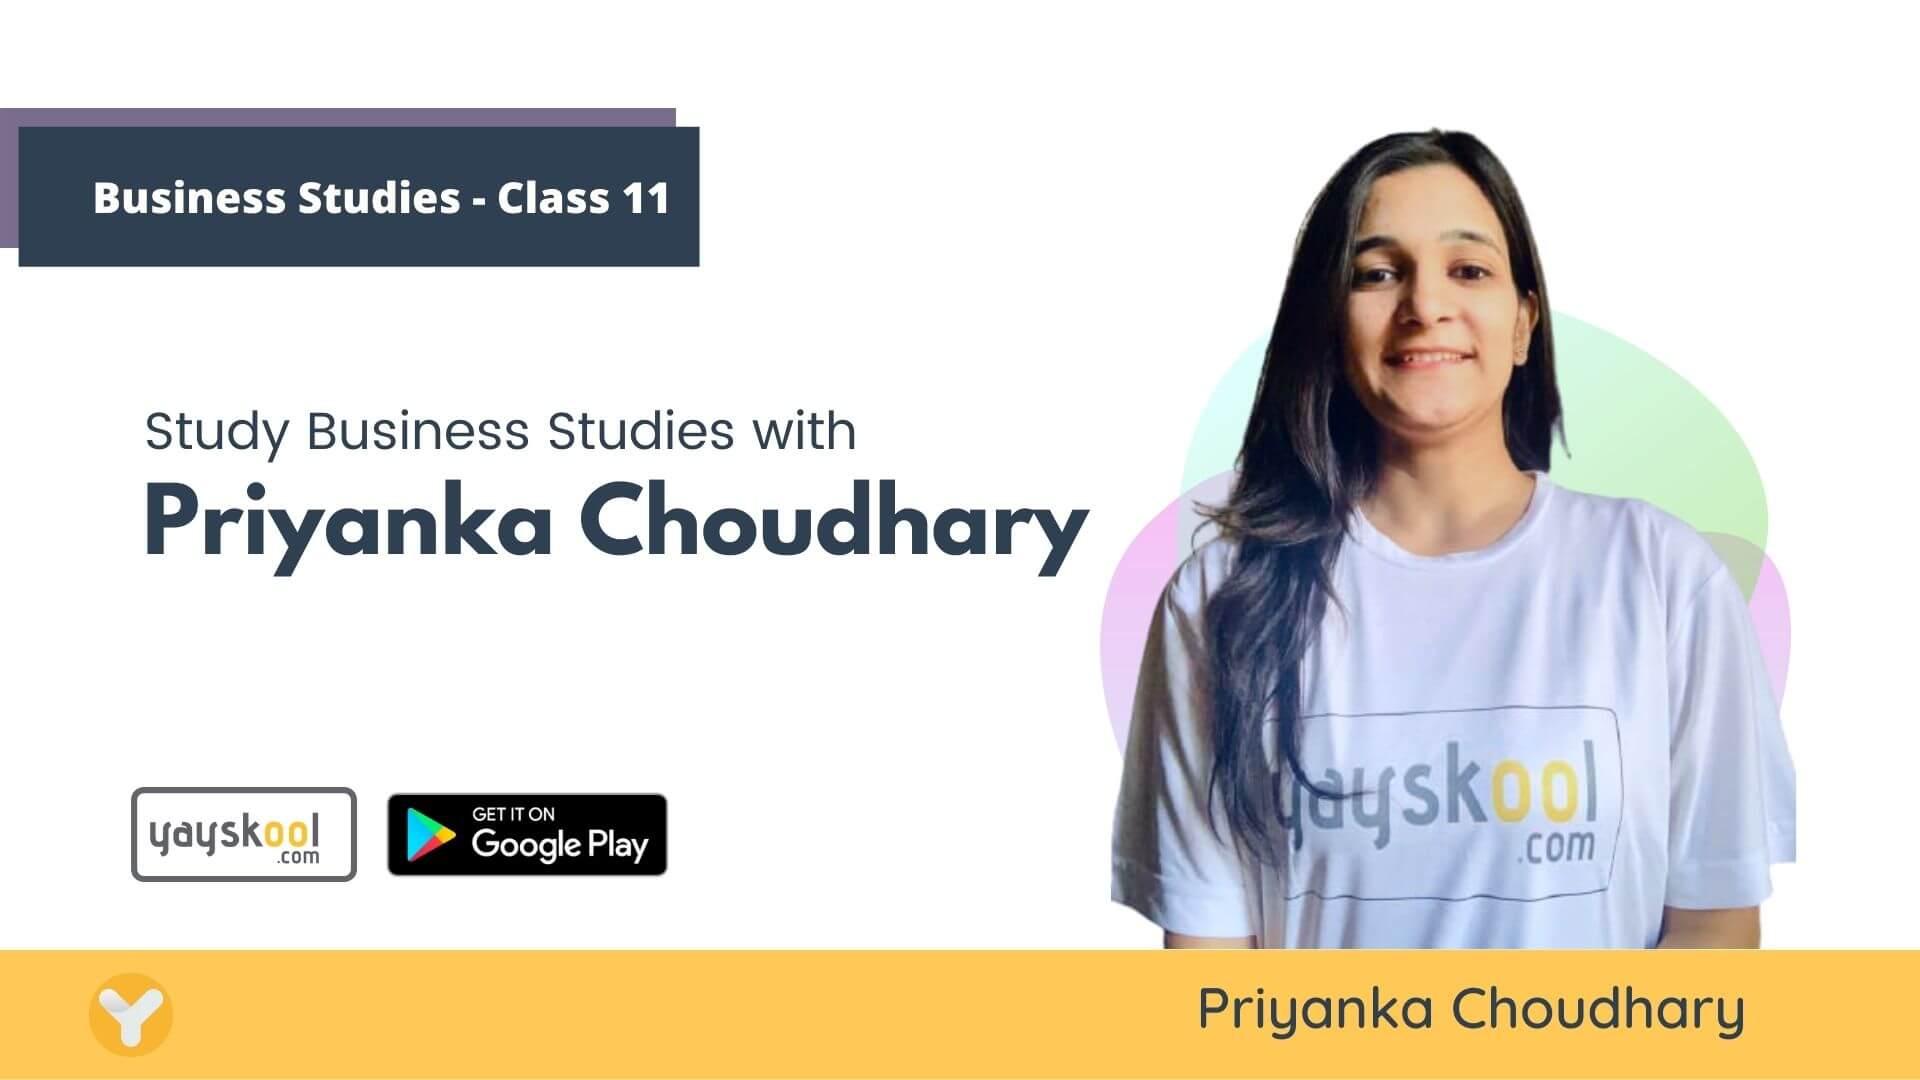 business-studies-course-class11-priyanka-choudhary